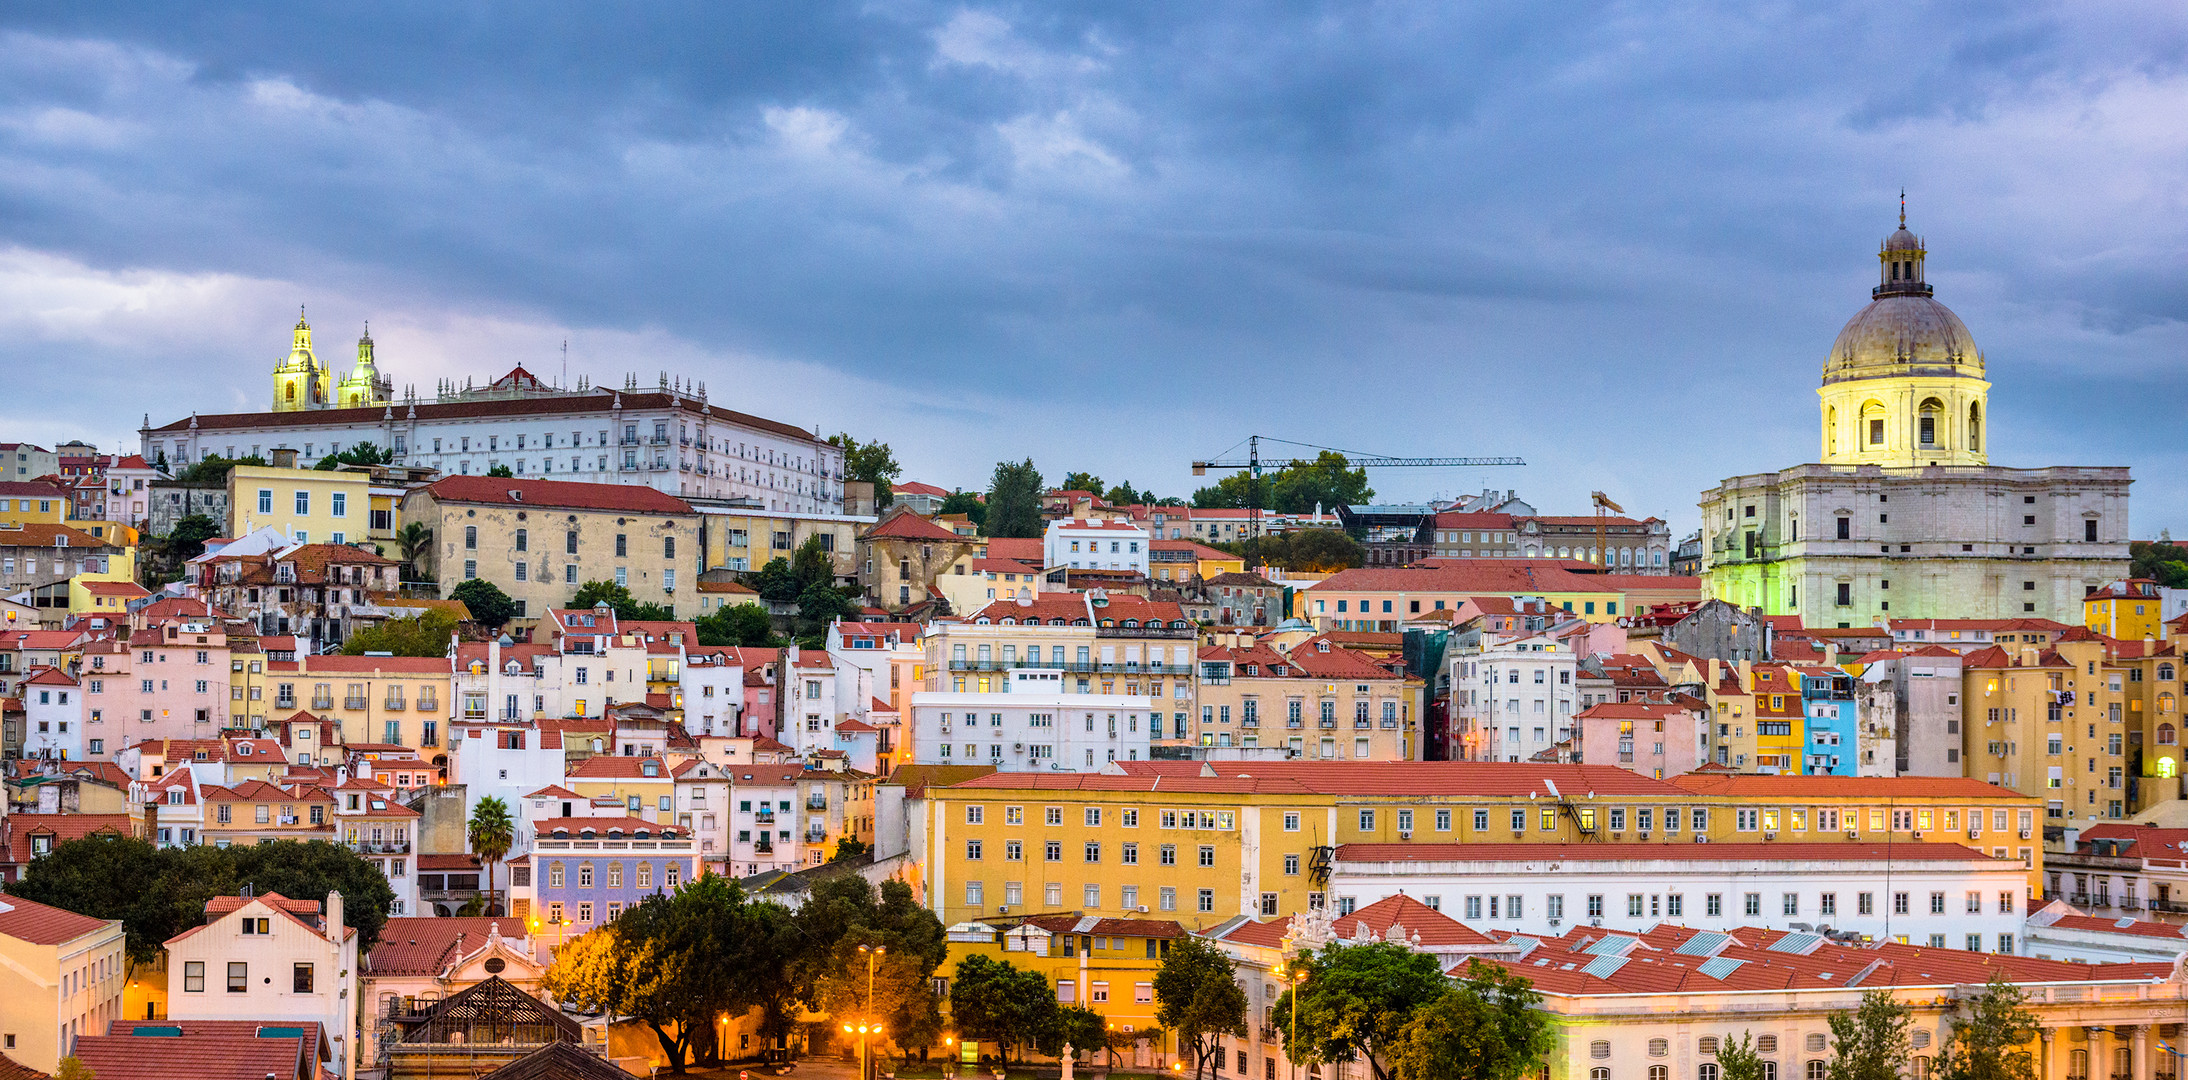 lisbon-portugal-alfama-PUF7RJU.jpg